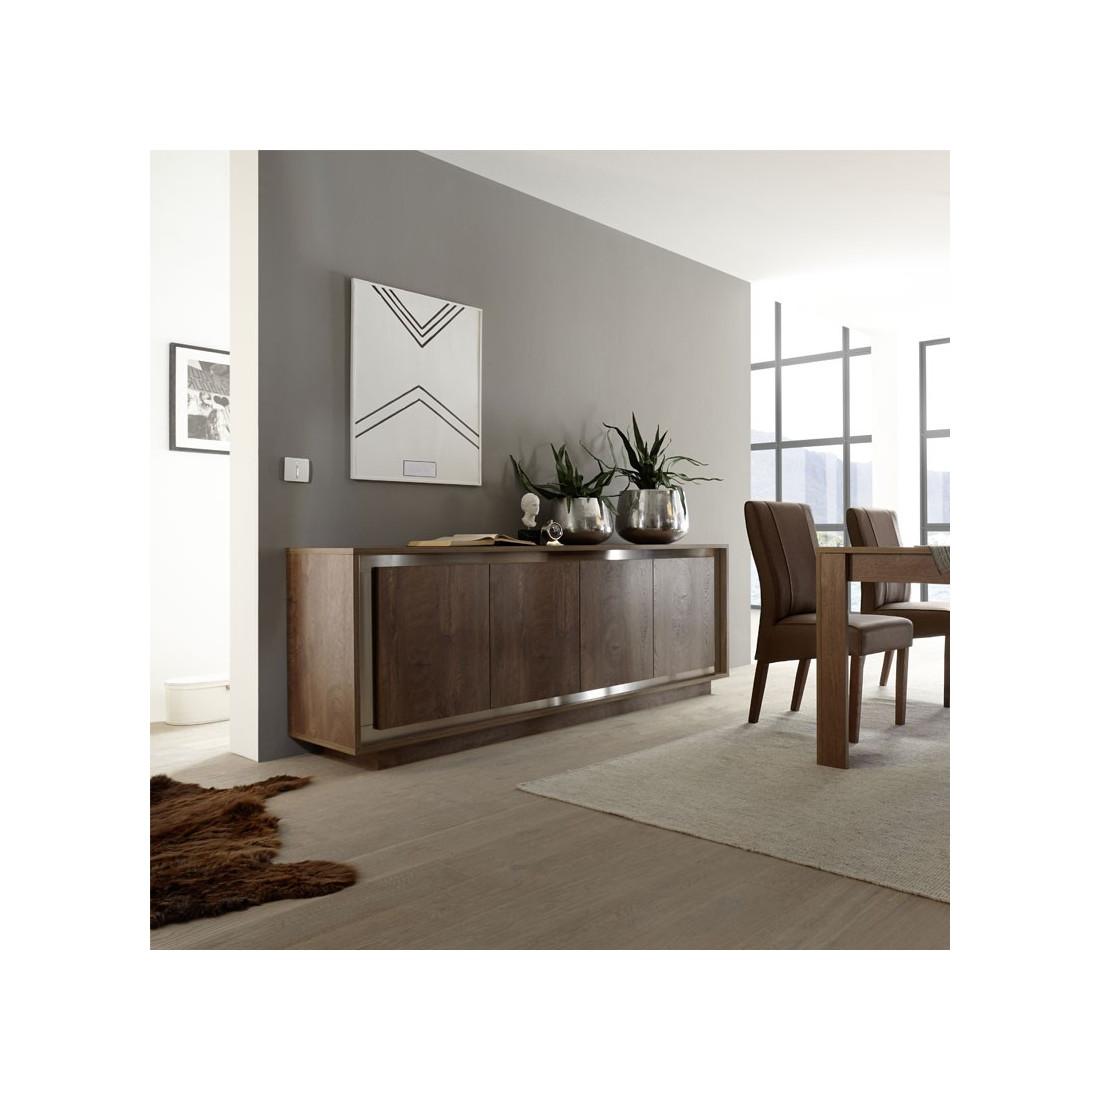 buffet 4 portes ch ne fonc et inox rimini univers salle manger. Black Bedroom Furniture Sets. Home Design Ideas